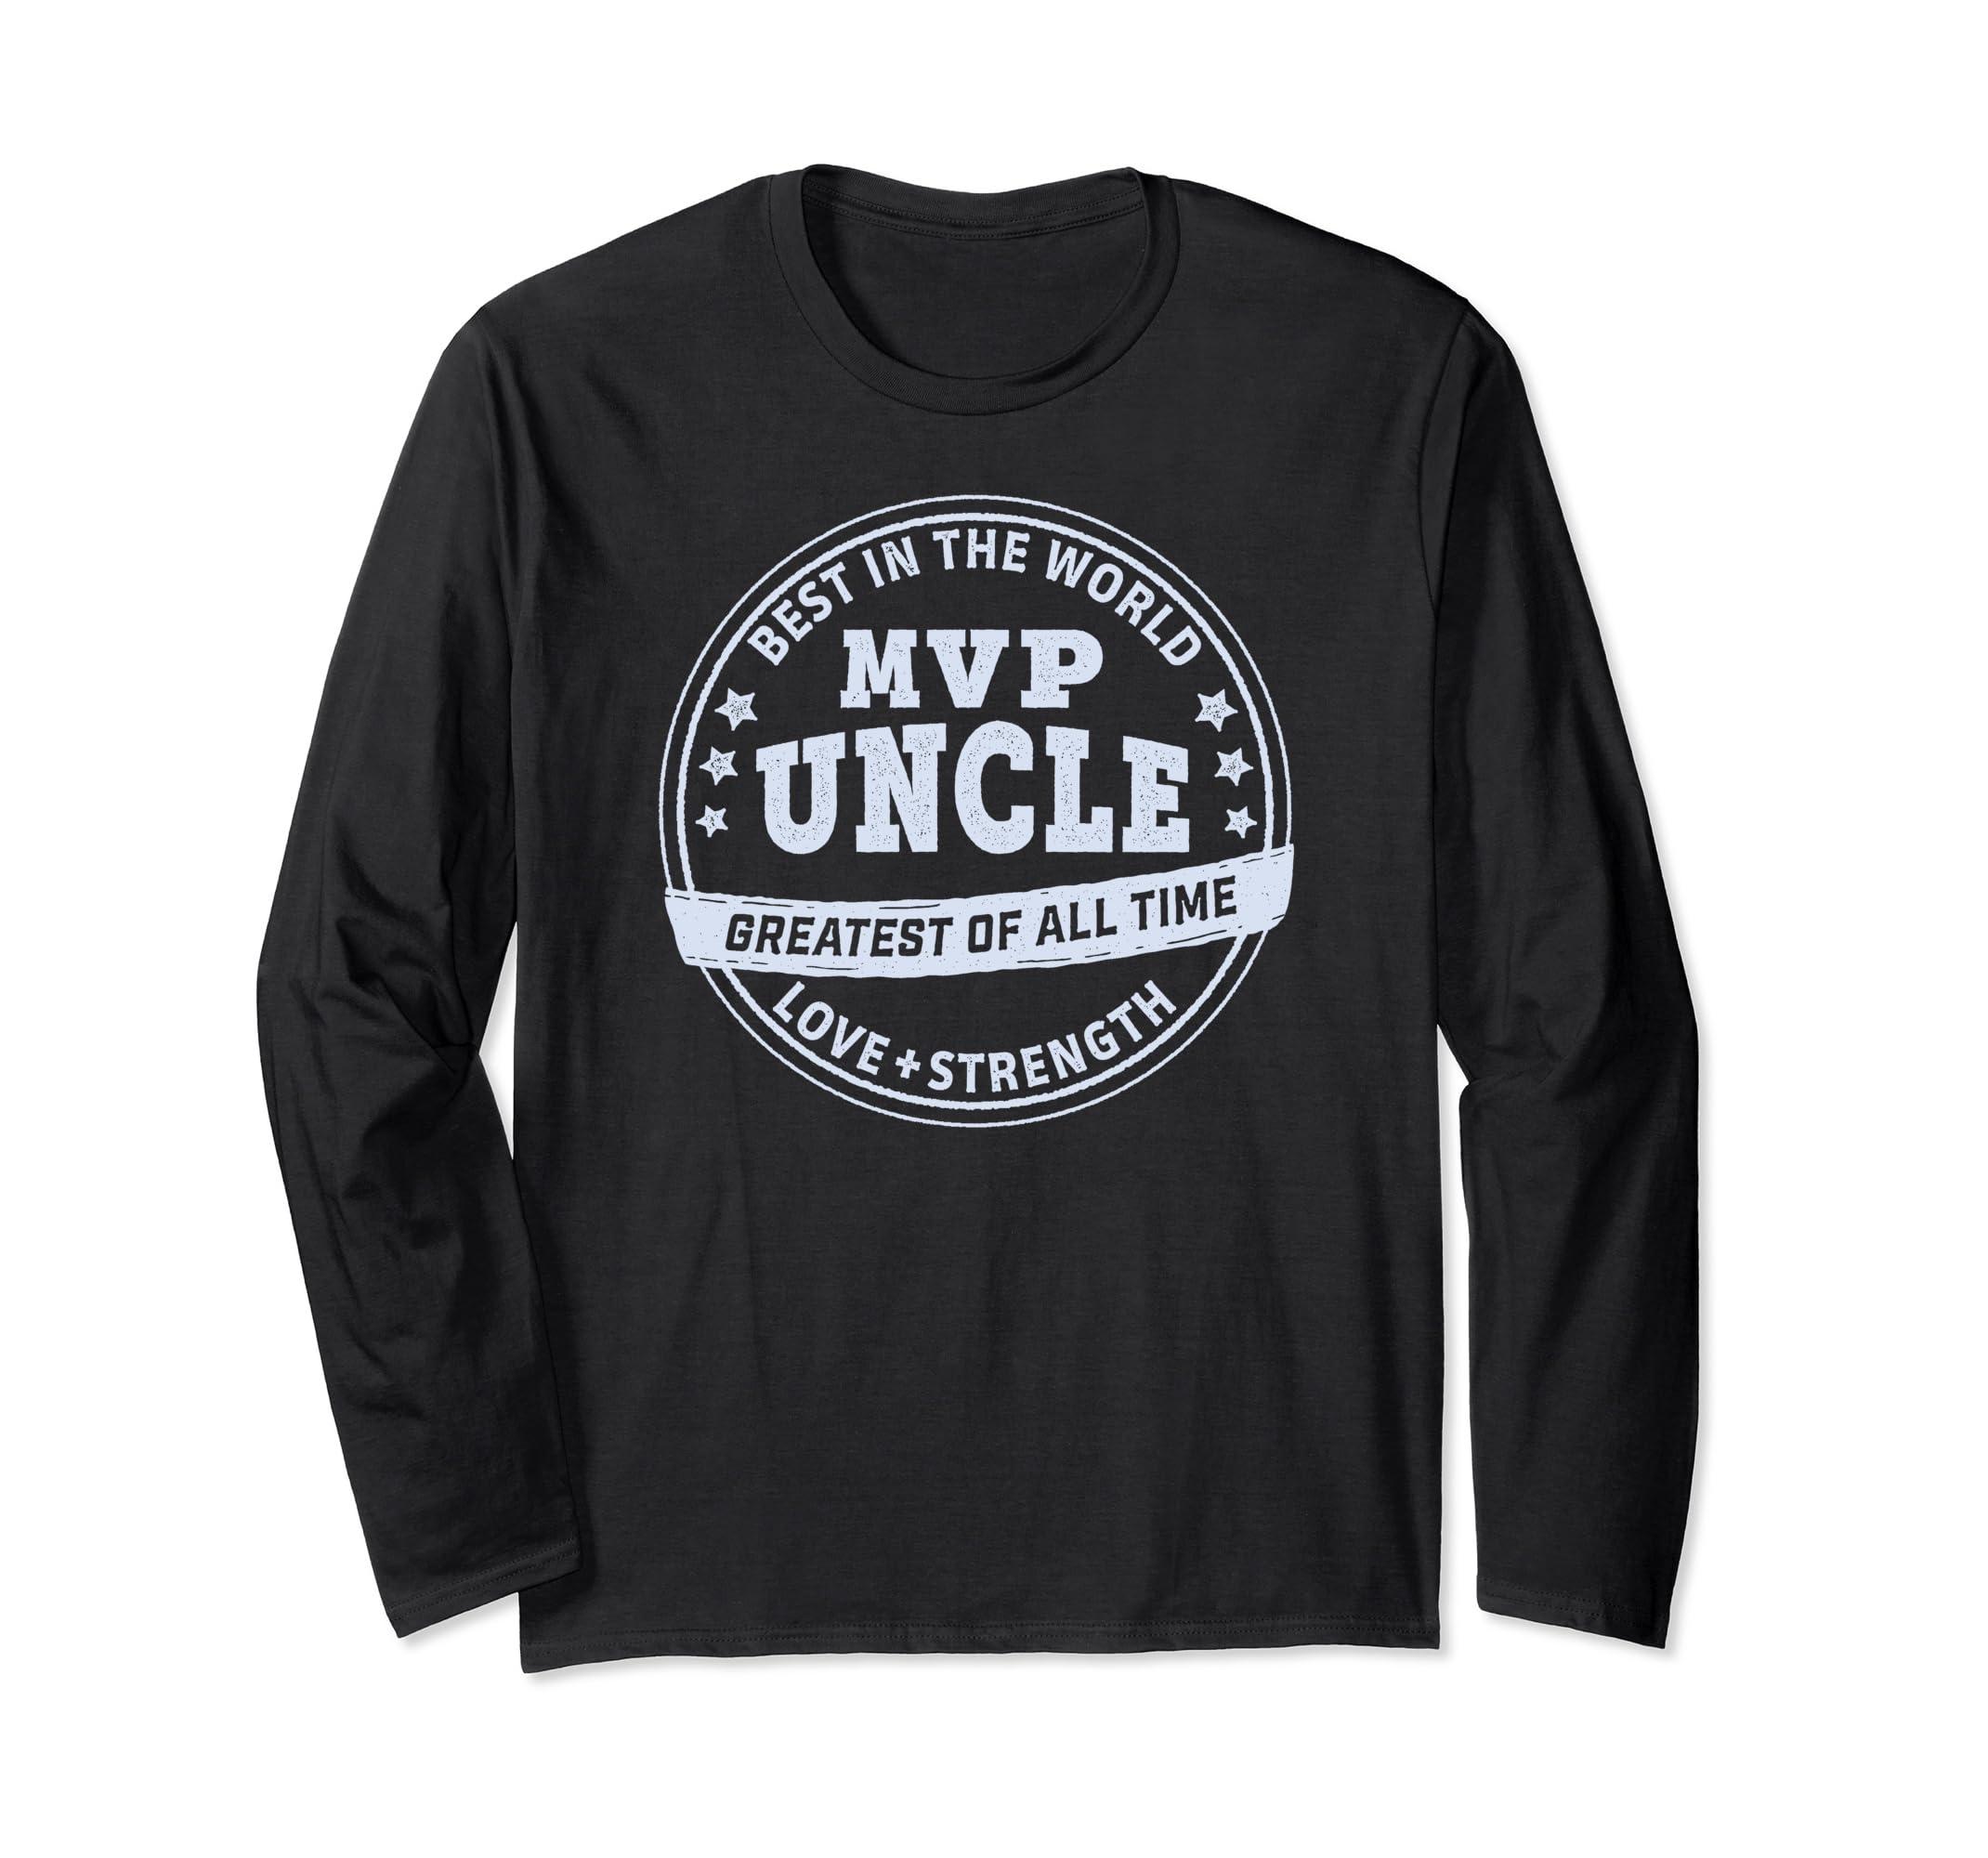 bf57a4095 Amazon.com: MVP Uncle GOAT Long Sleeve Shirt: Clothing